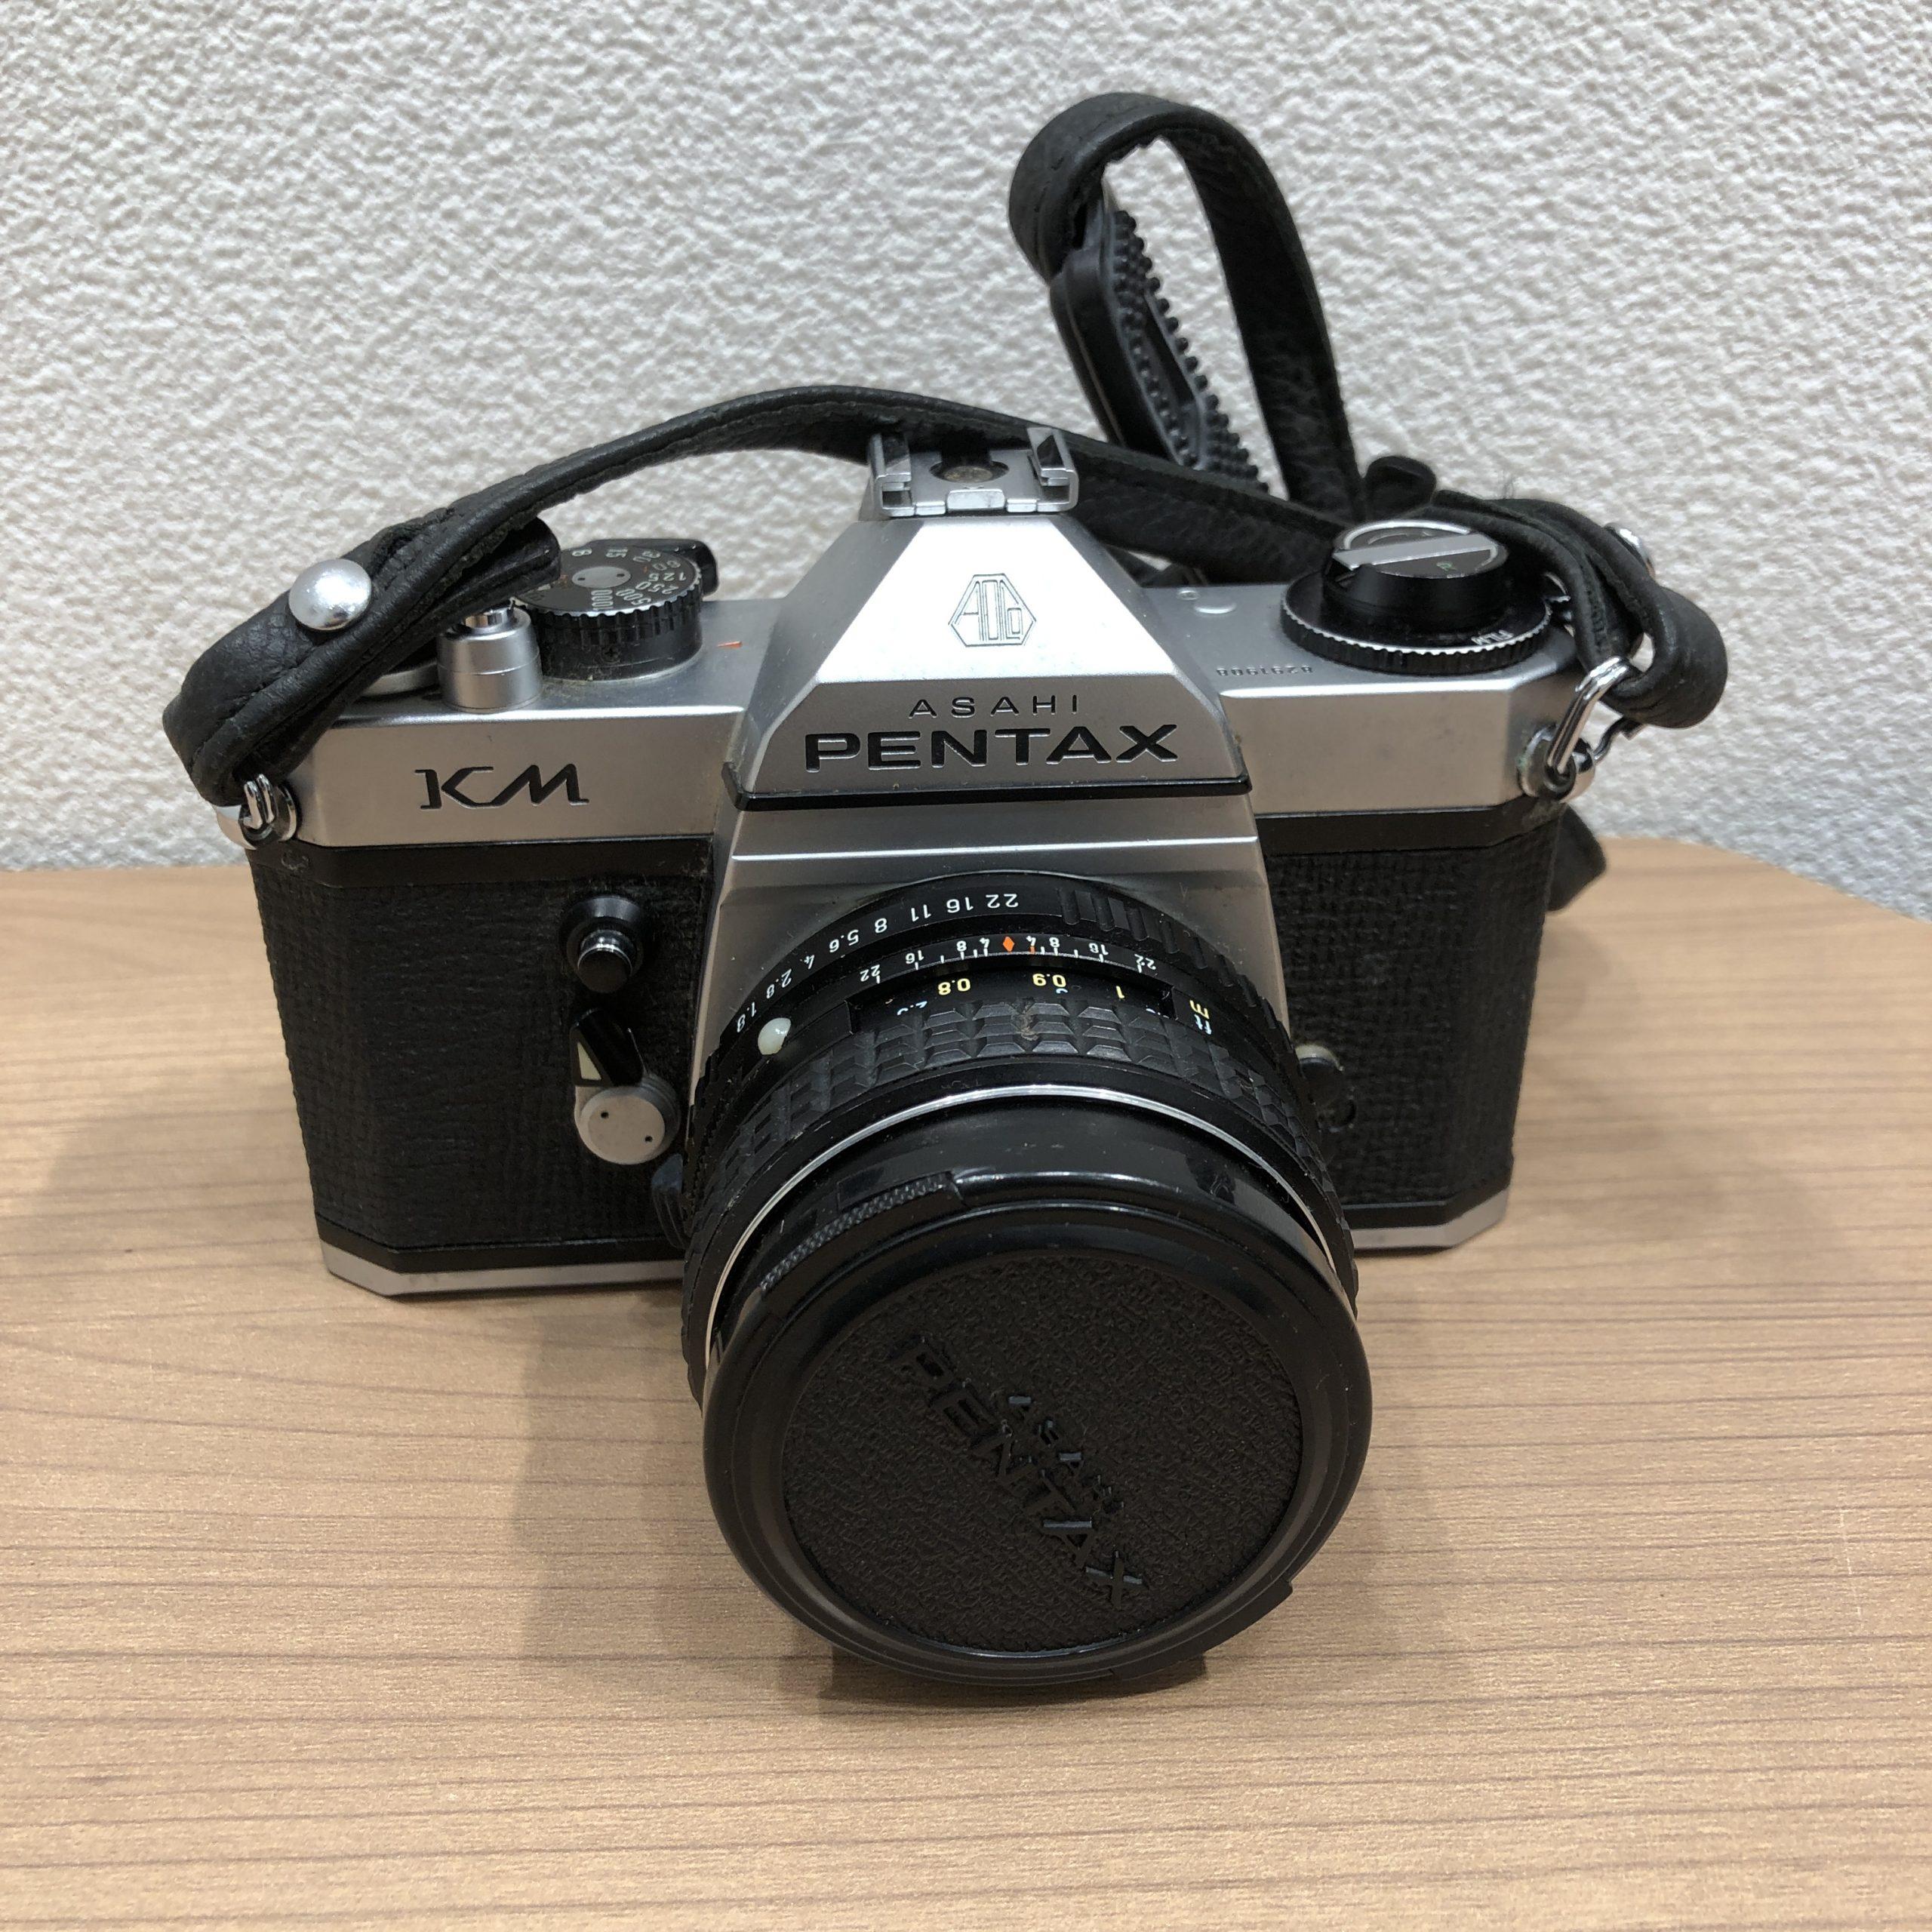 【PENTAX/ペンタックス】KM カメラ